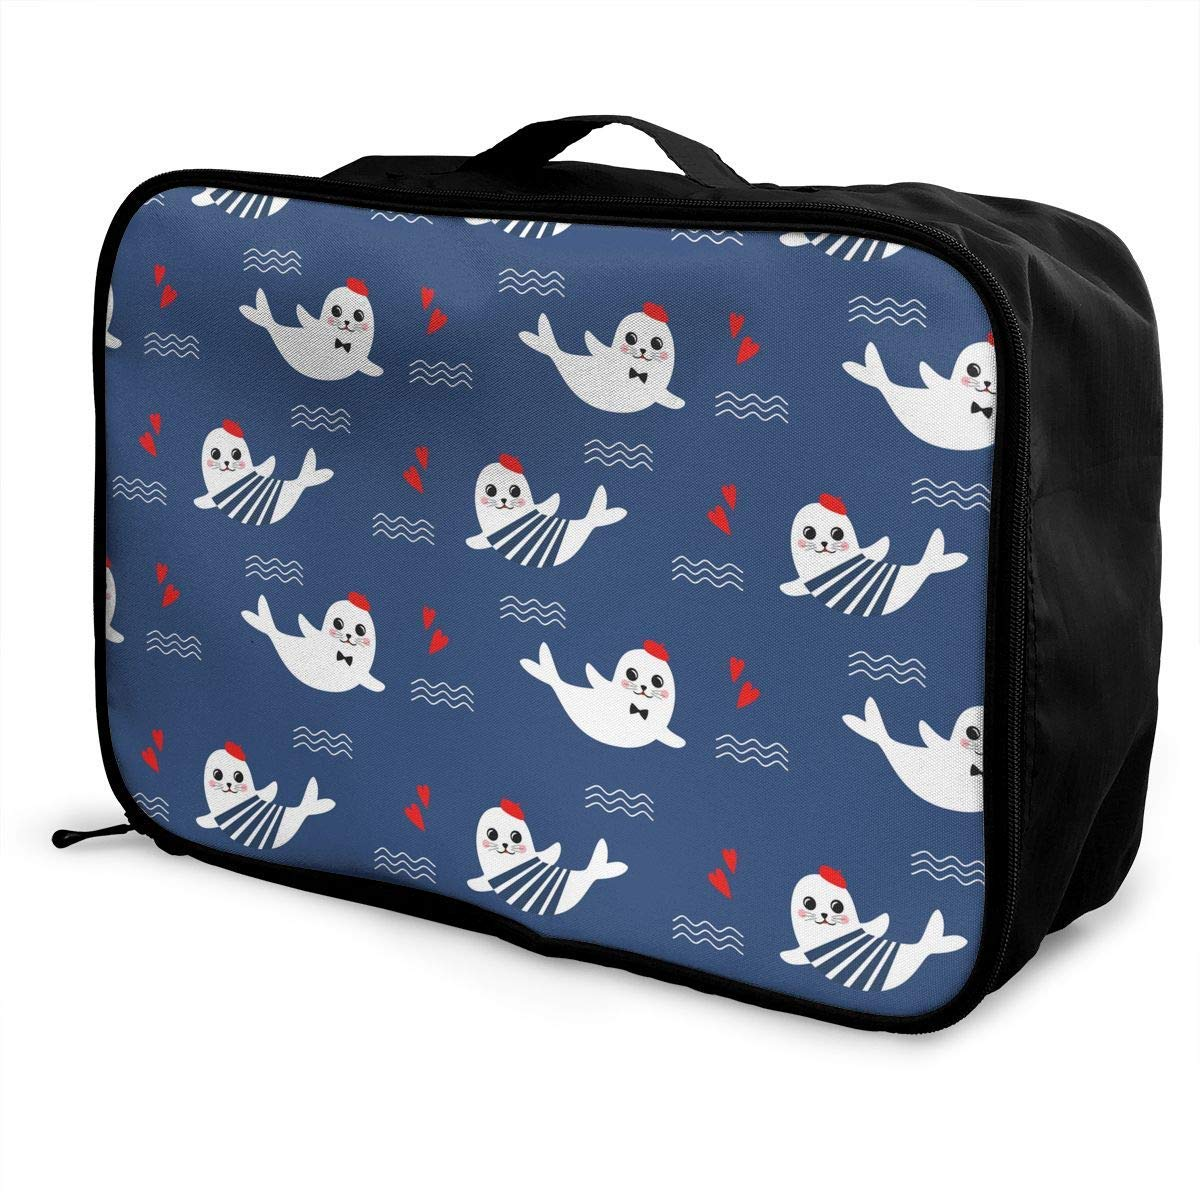 JTRVW Travel Luggage Trolley Bag Portable Lightweight Suitcases Duffle Tote Bag Handbag Cute Baby Fur Seal Pattern